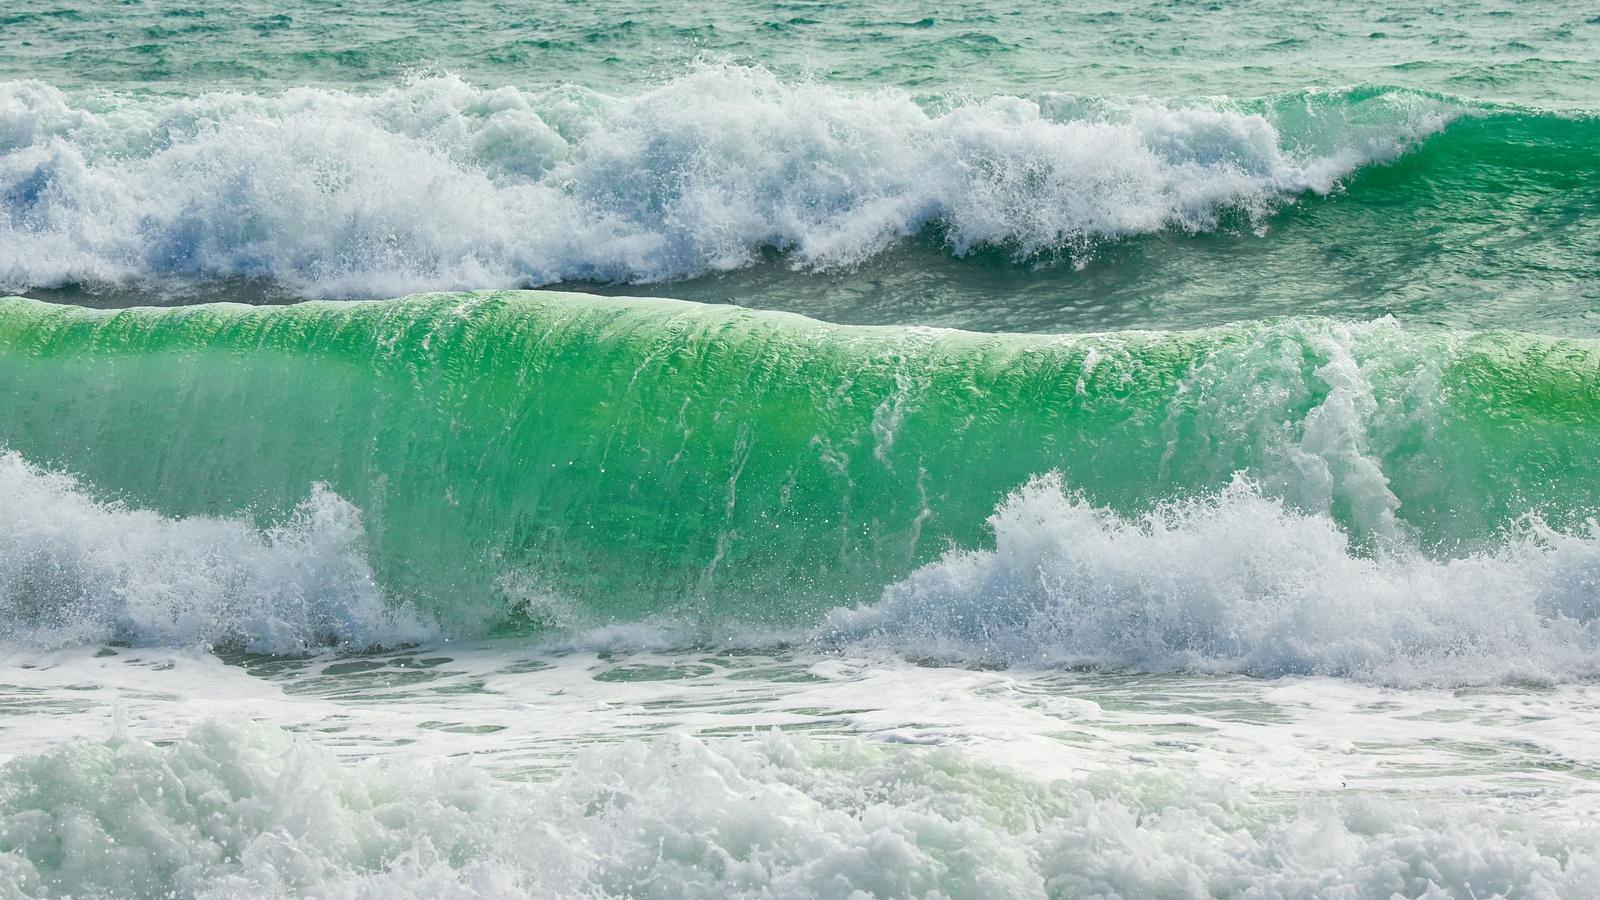 blue, wave, пляж, лето, summer, seascape, sea, море, beach, волны, ocean